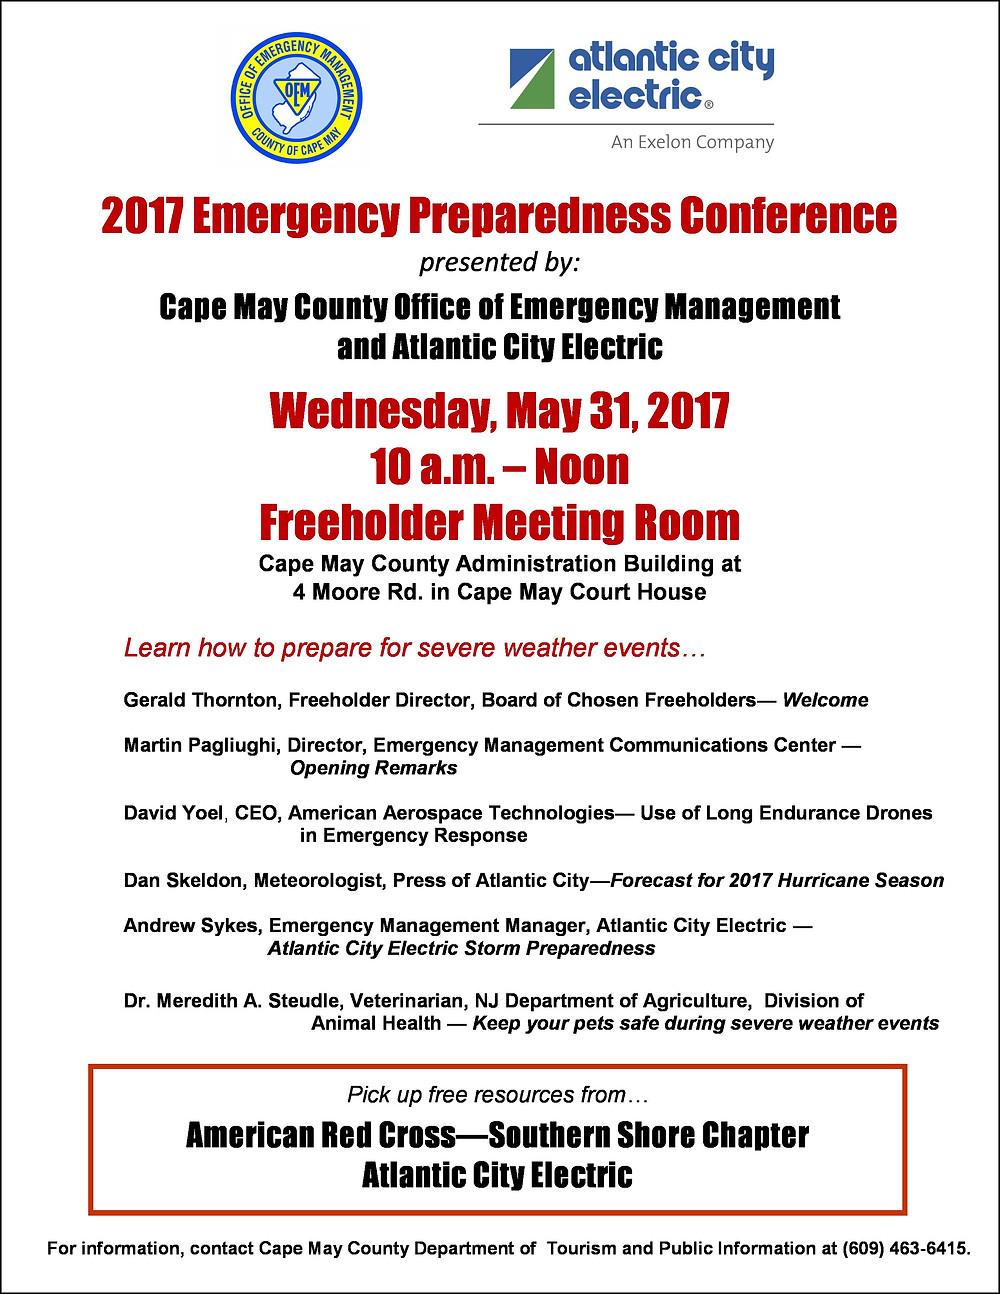 OEM Flyer - 2017 Conference-page-0.jpg